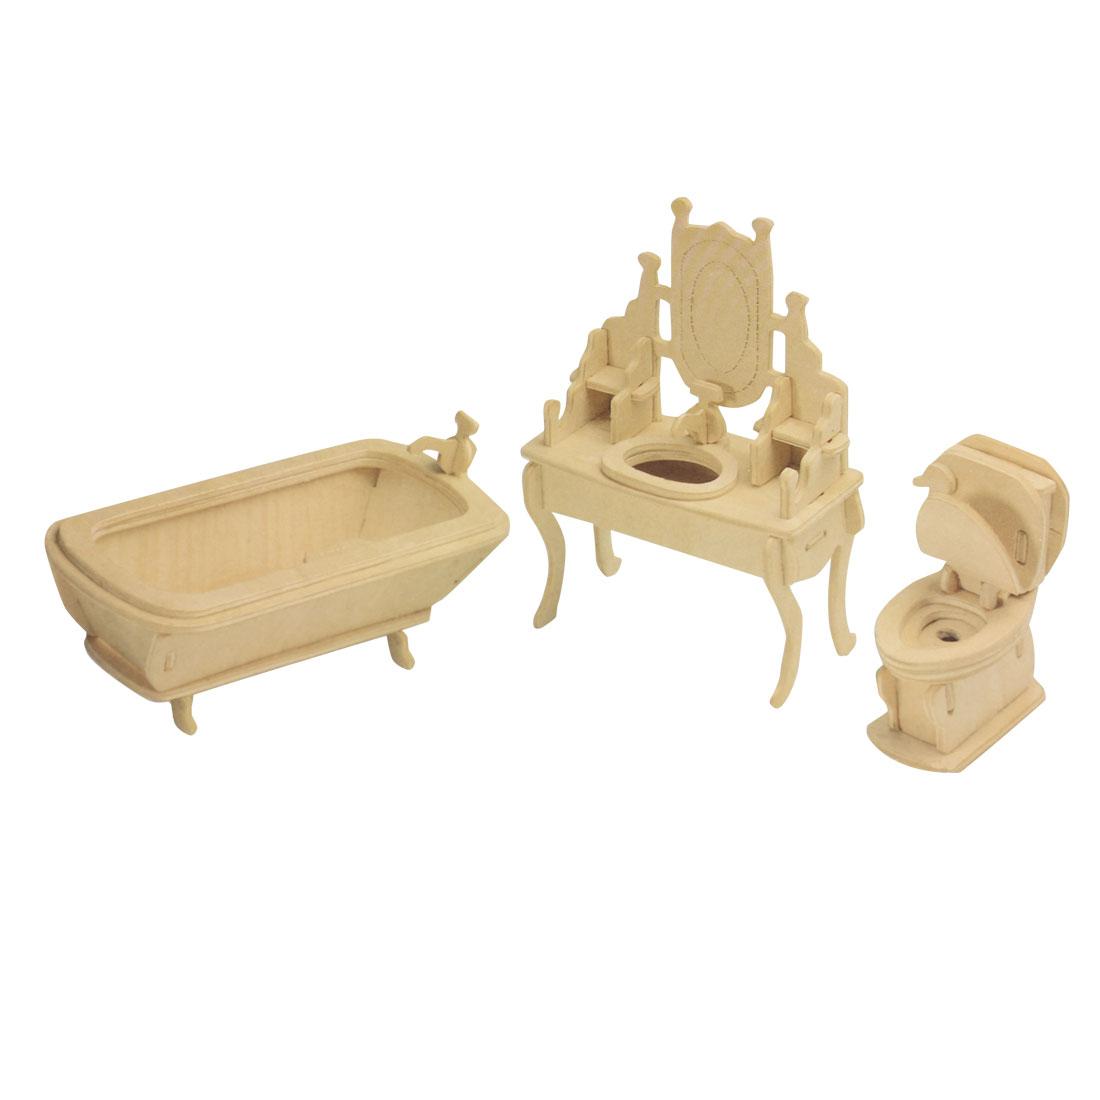 Kids 3D Wood Craft DIY Bathroom Model Wooden Construction Kit Toy Gift